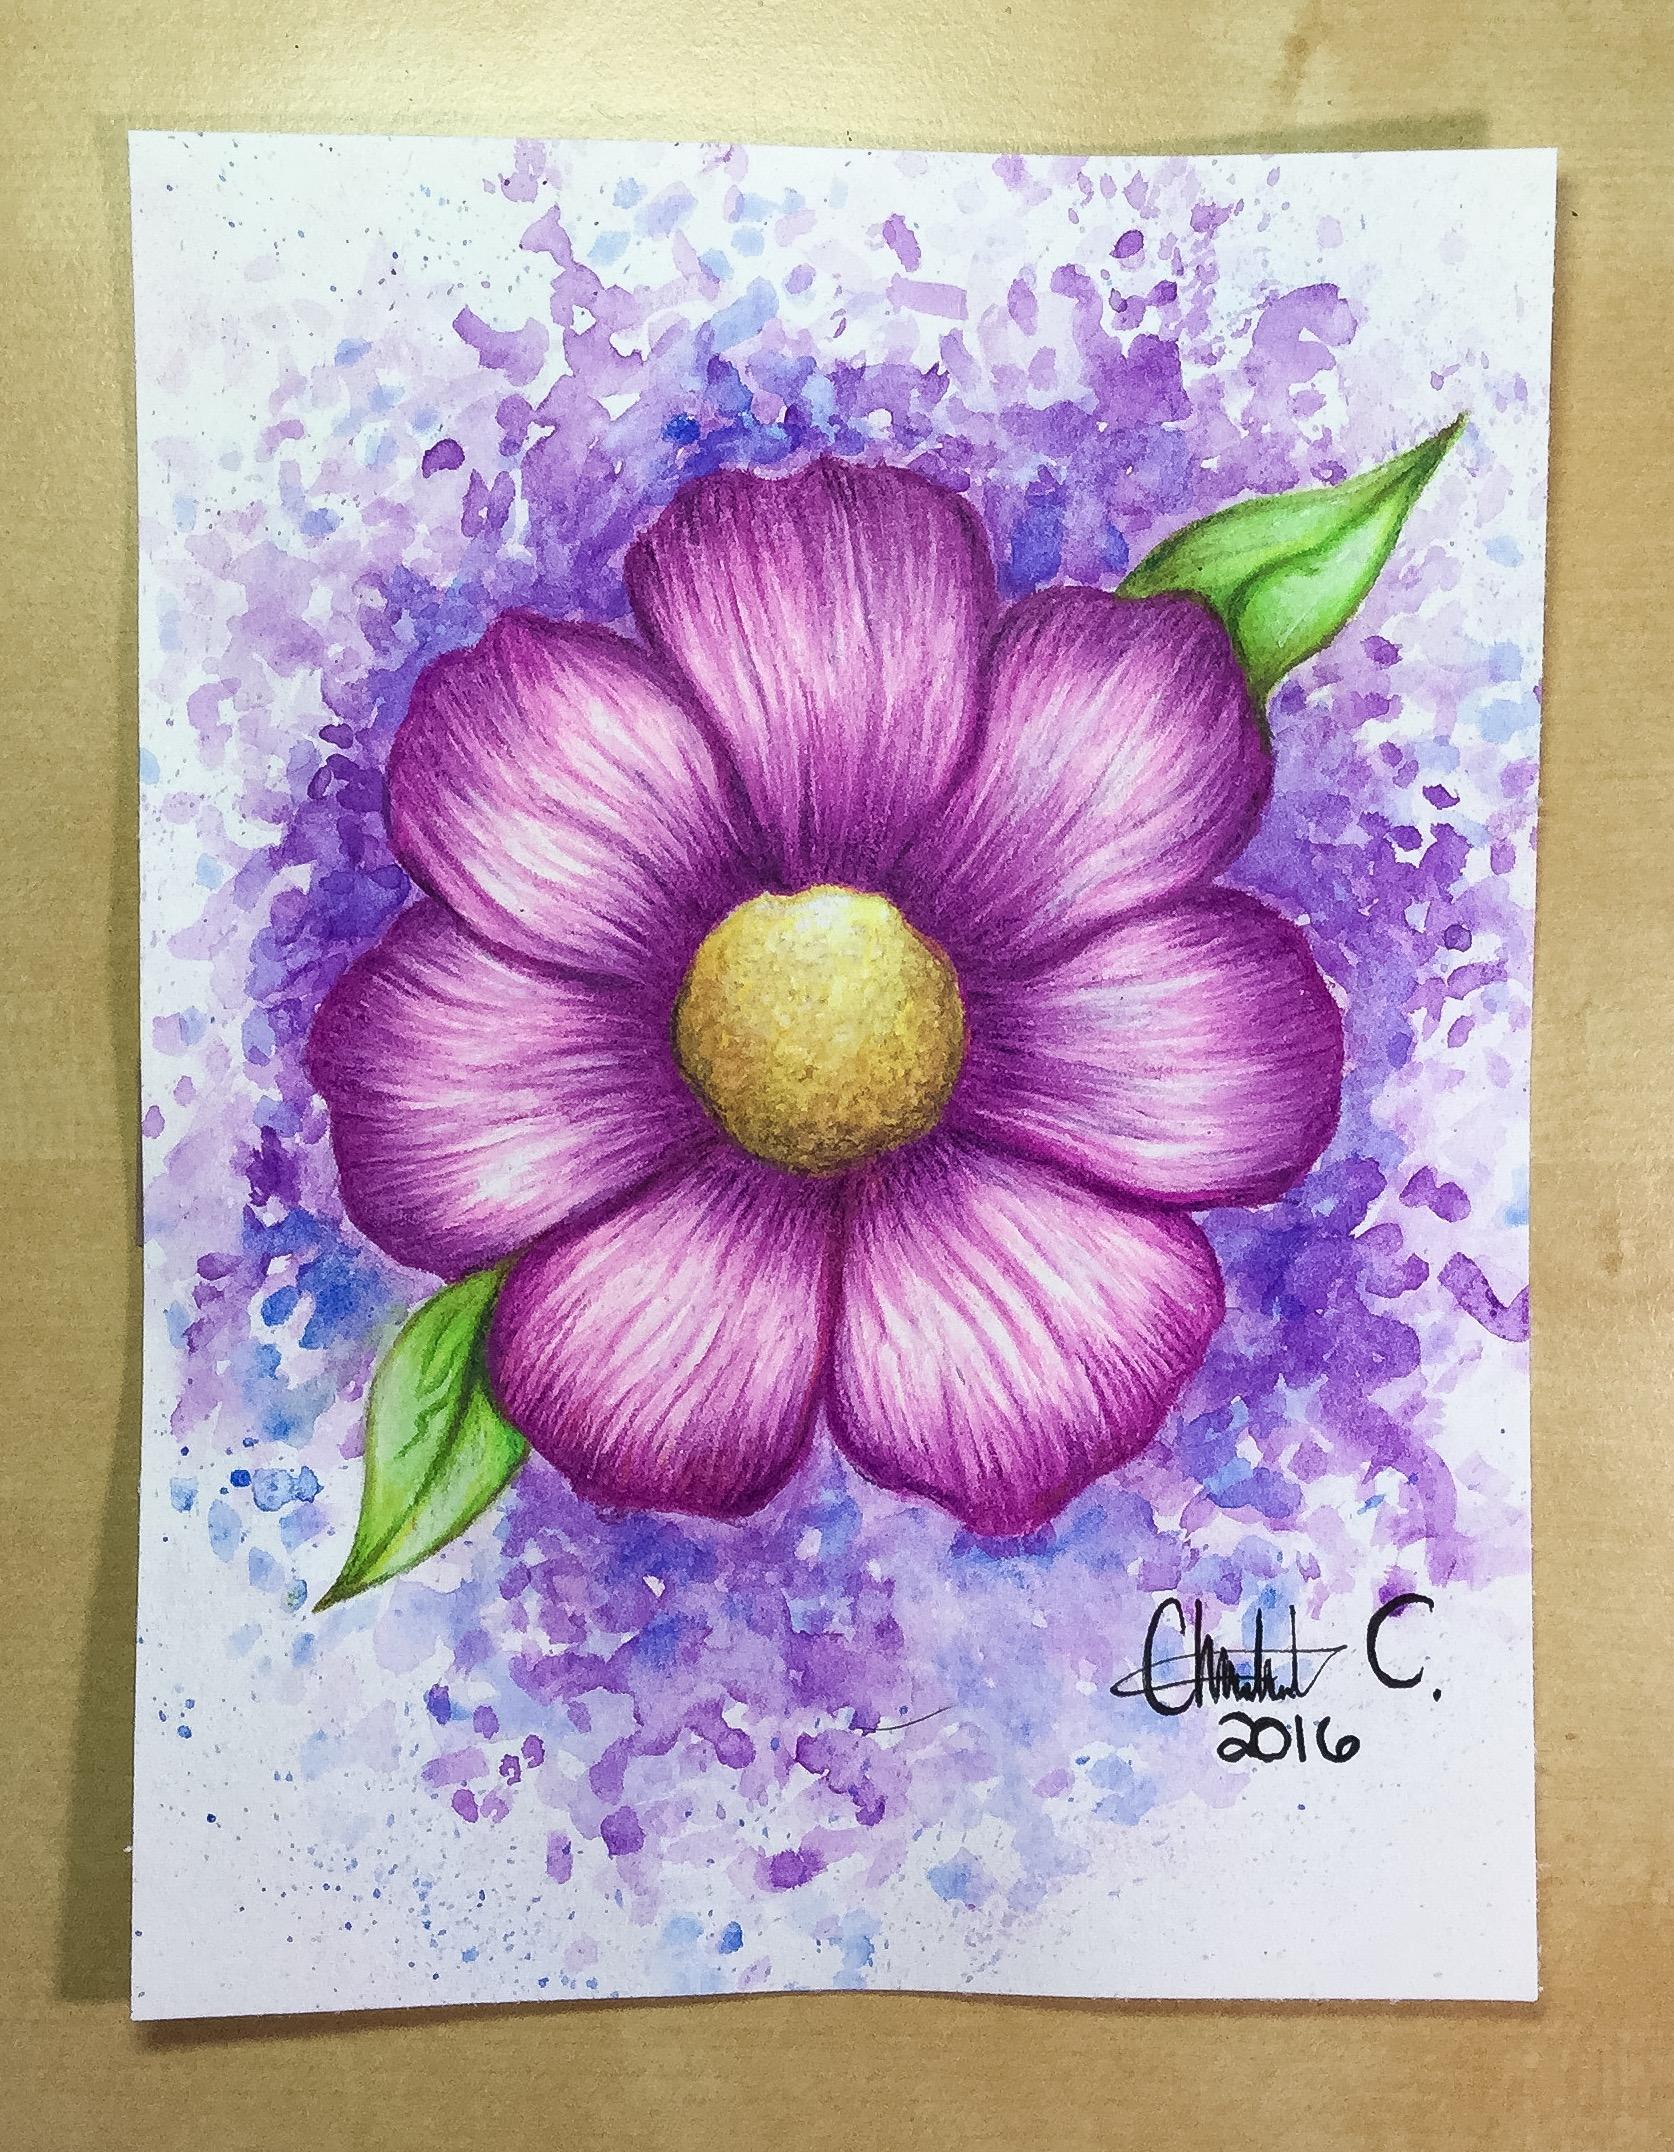 Watercolor Pencil Drawing of a Flower by Artistlizard101 on DeviantArt